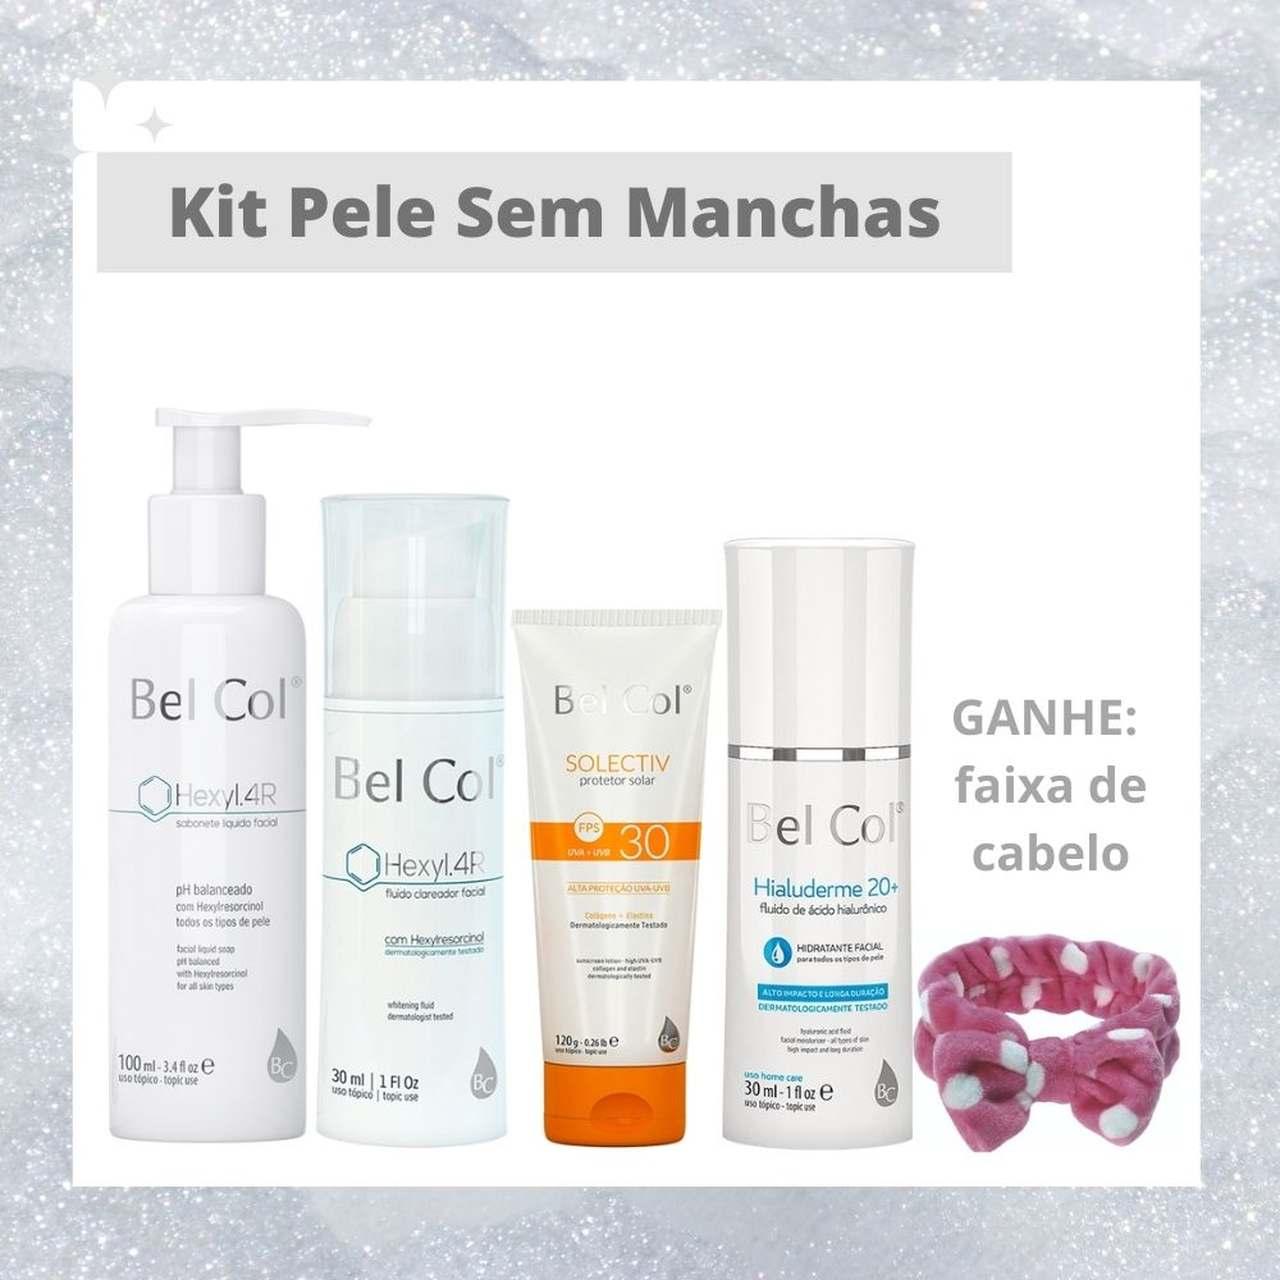 Kit Pele Sem Manchas - Skincare Completo Para Pele Uniforme